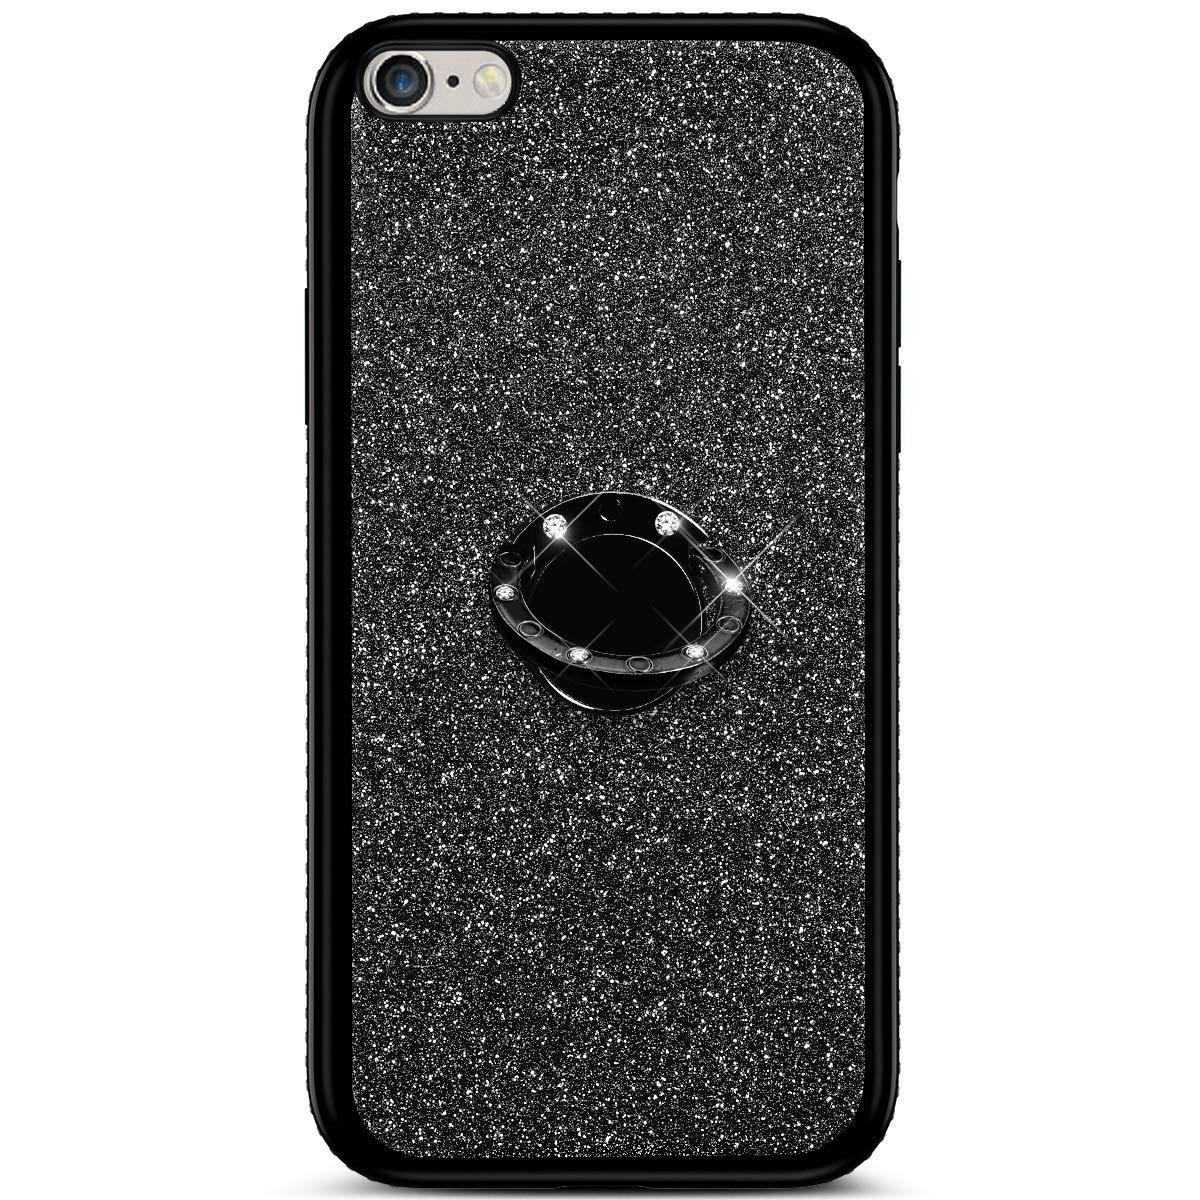 6S Plus Misstars Luxe Diamant Strass Housse de Protection Anti-Rayures Souple Silicone TPU Bumper avec Anneau Kickstand pour iPhone 6 Plus Bling Glitter Coque pour iPhone 6S Plus Or Rose 5,5